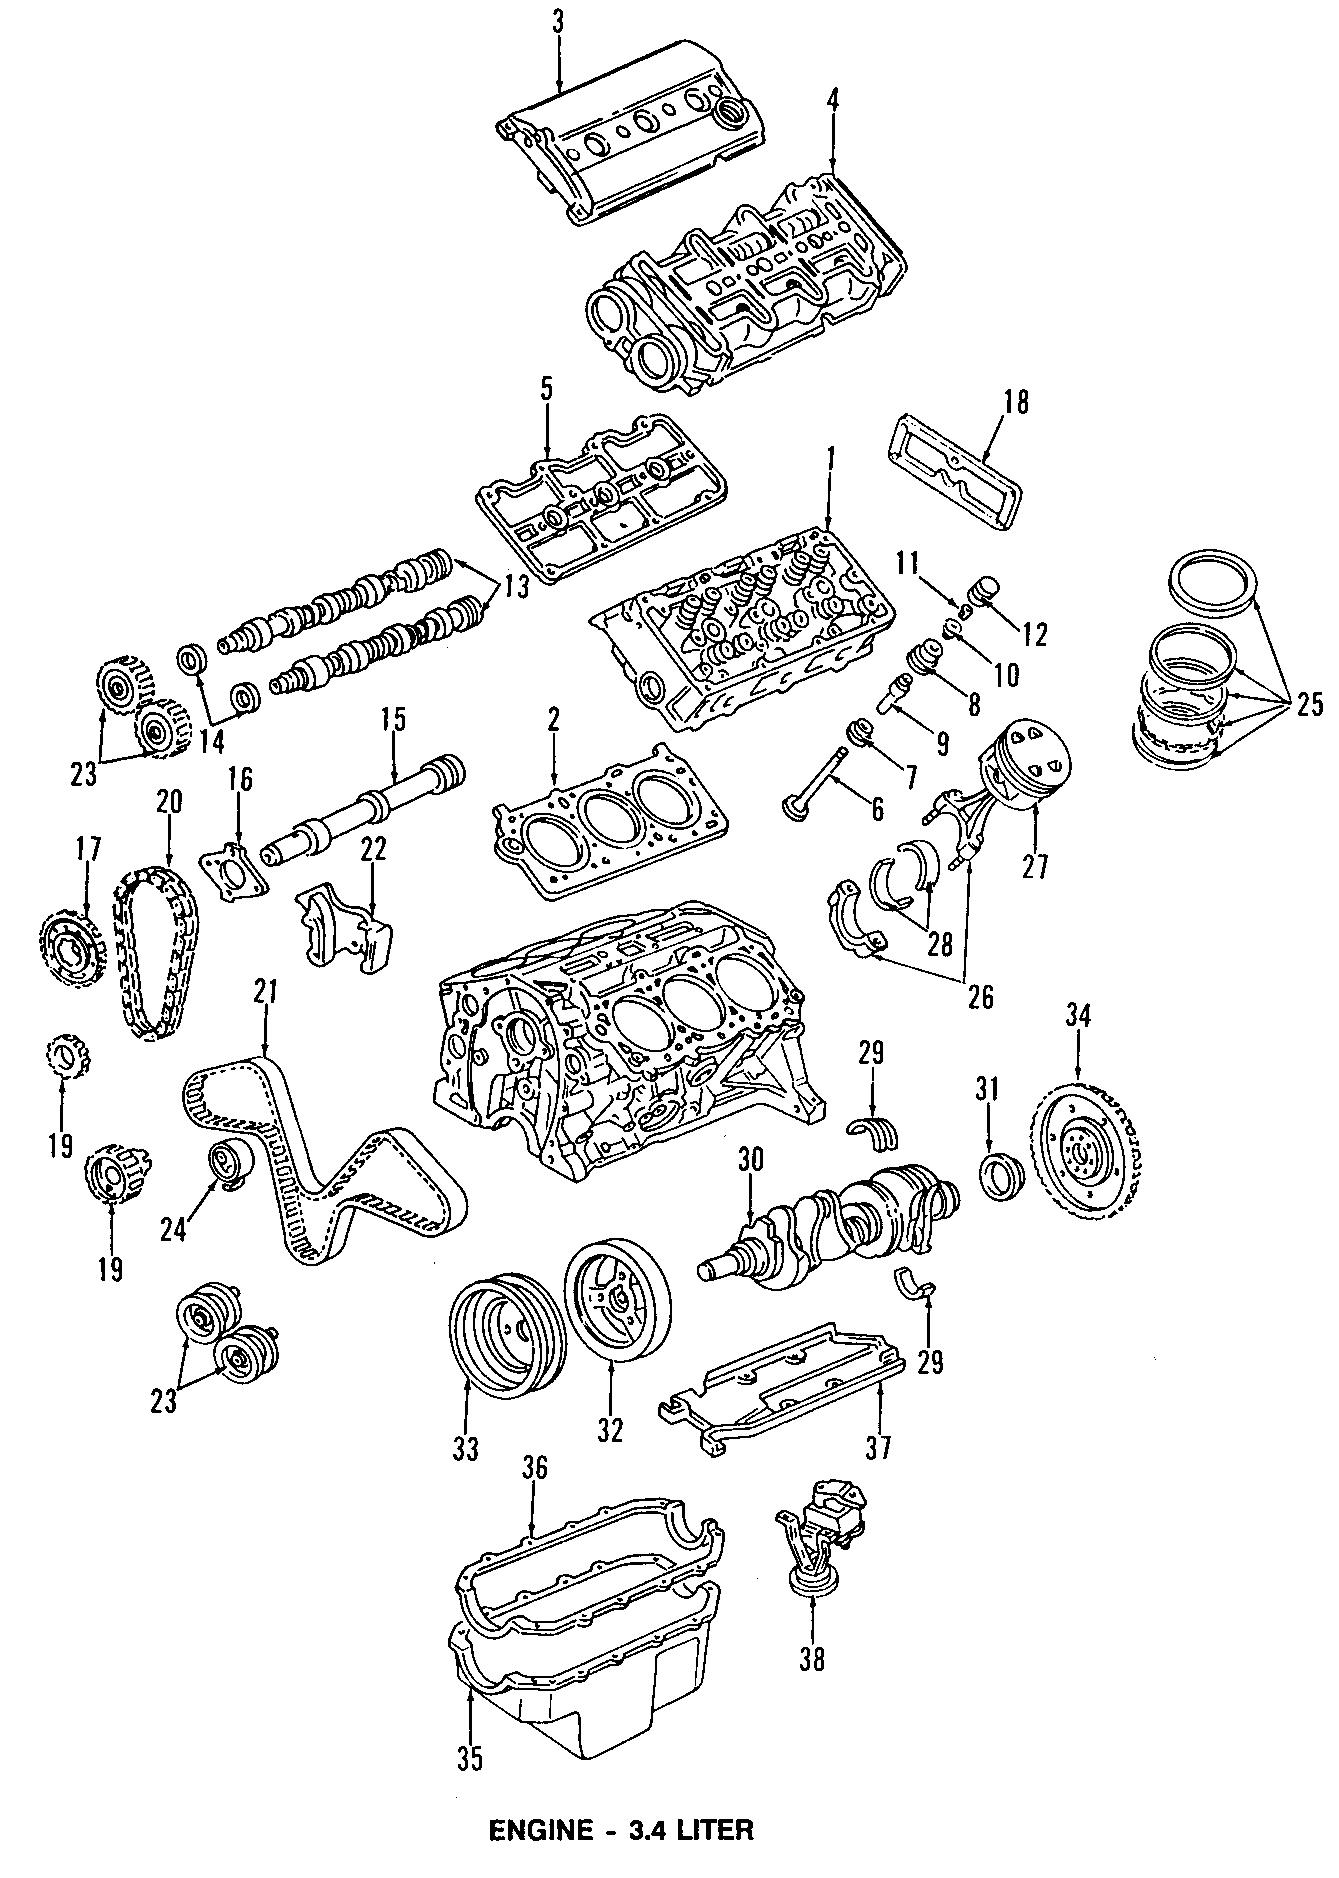 Chevrolet Monte Carlo Engine Valve Stem Oil Seal. Valve